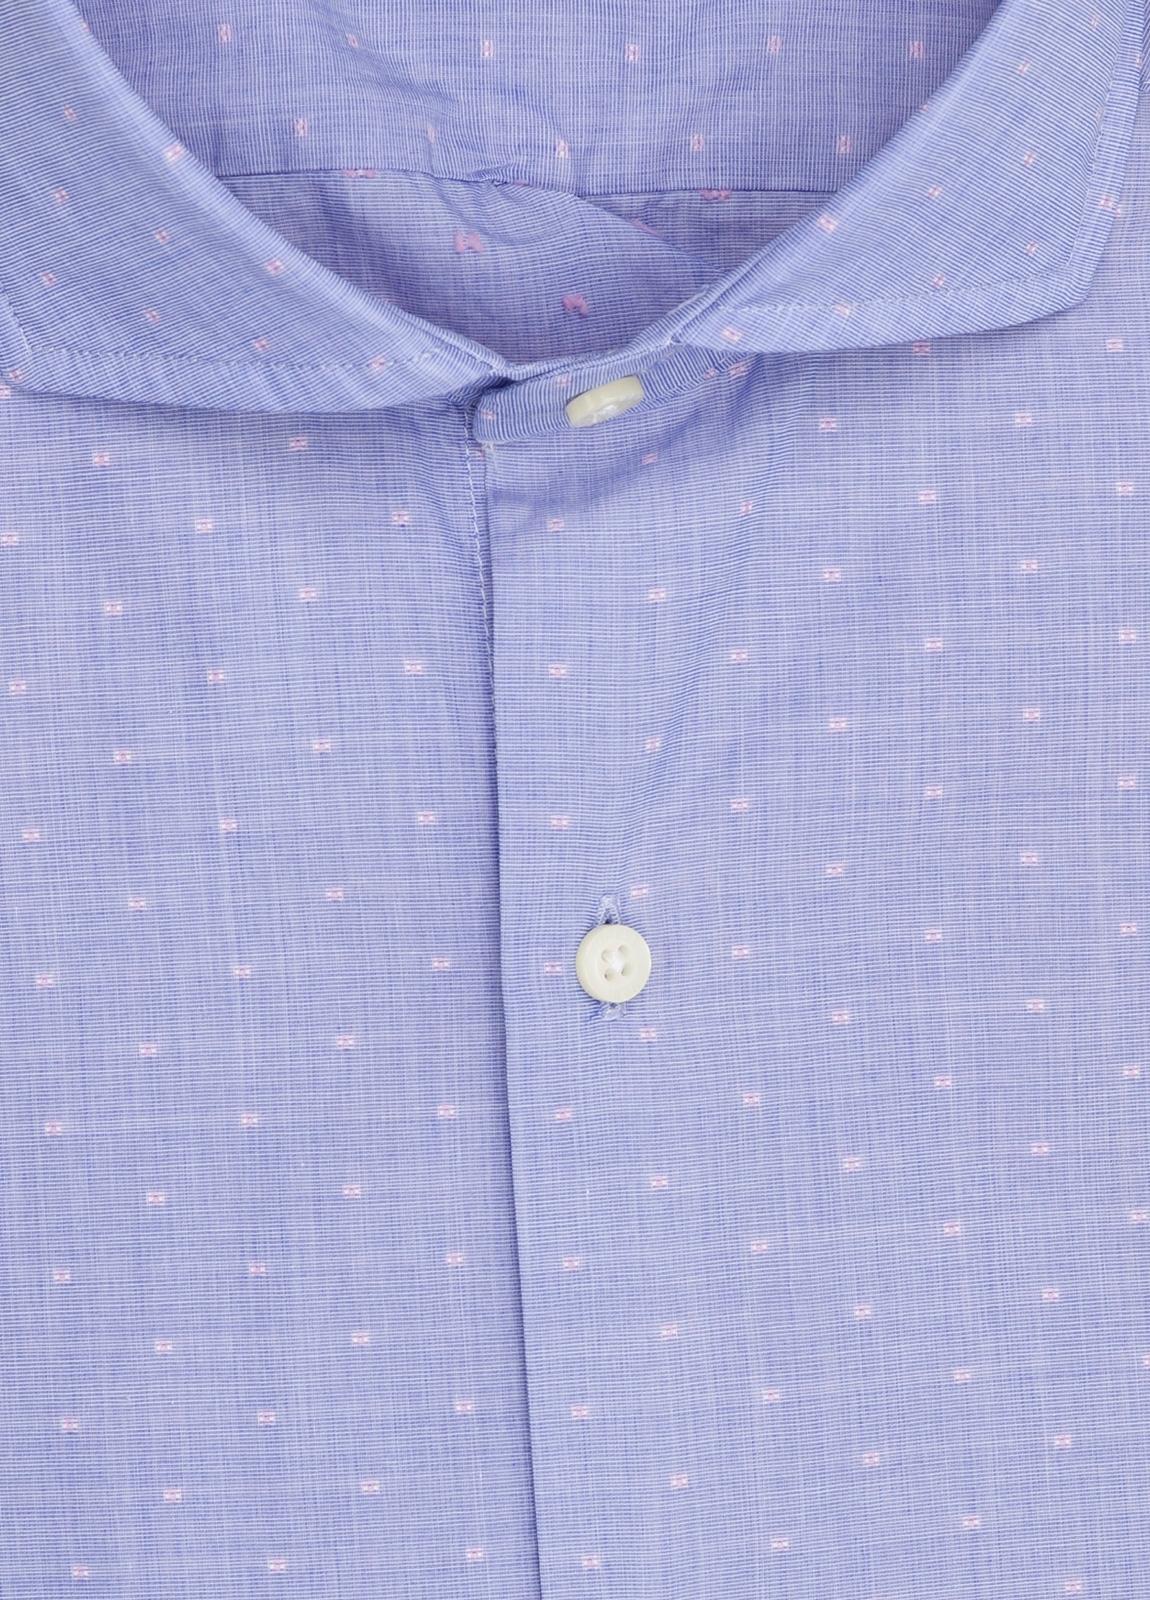 Camisa Casual Wear FUREST COLECCIÓN slim fit fil coupé azul - Ítem2